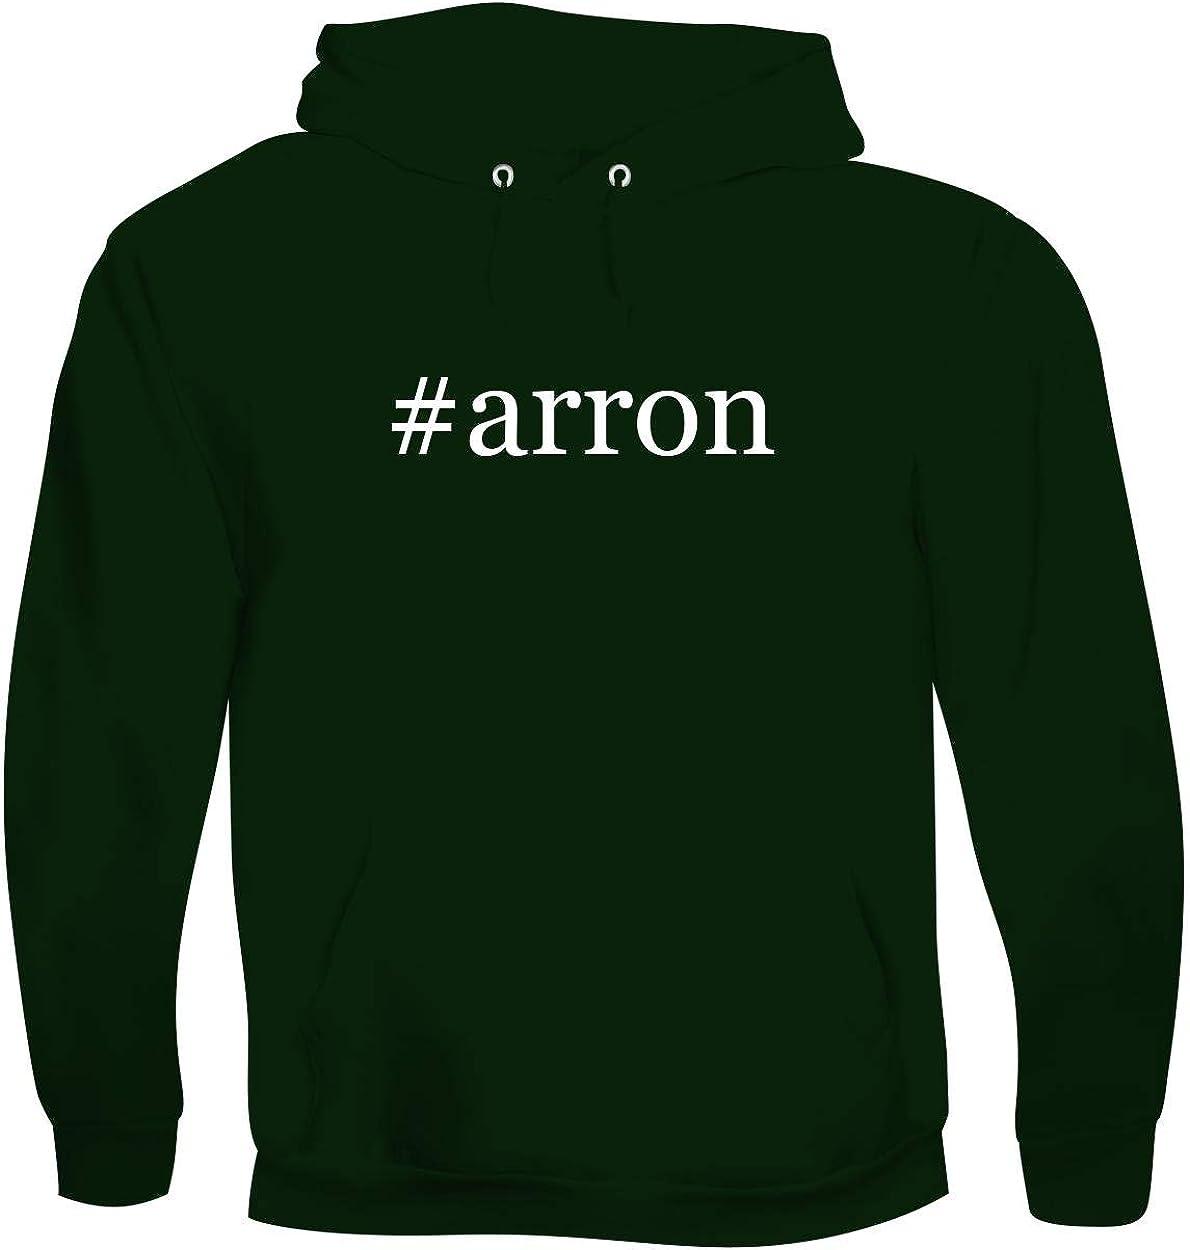 #arron - Men's Hashtag Soft & Comfortable Hoodie Sweatshirt Pullover 51dw%2B1lKWPL